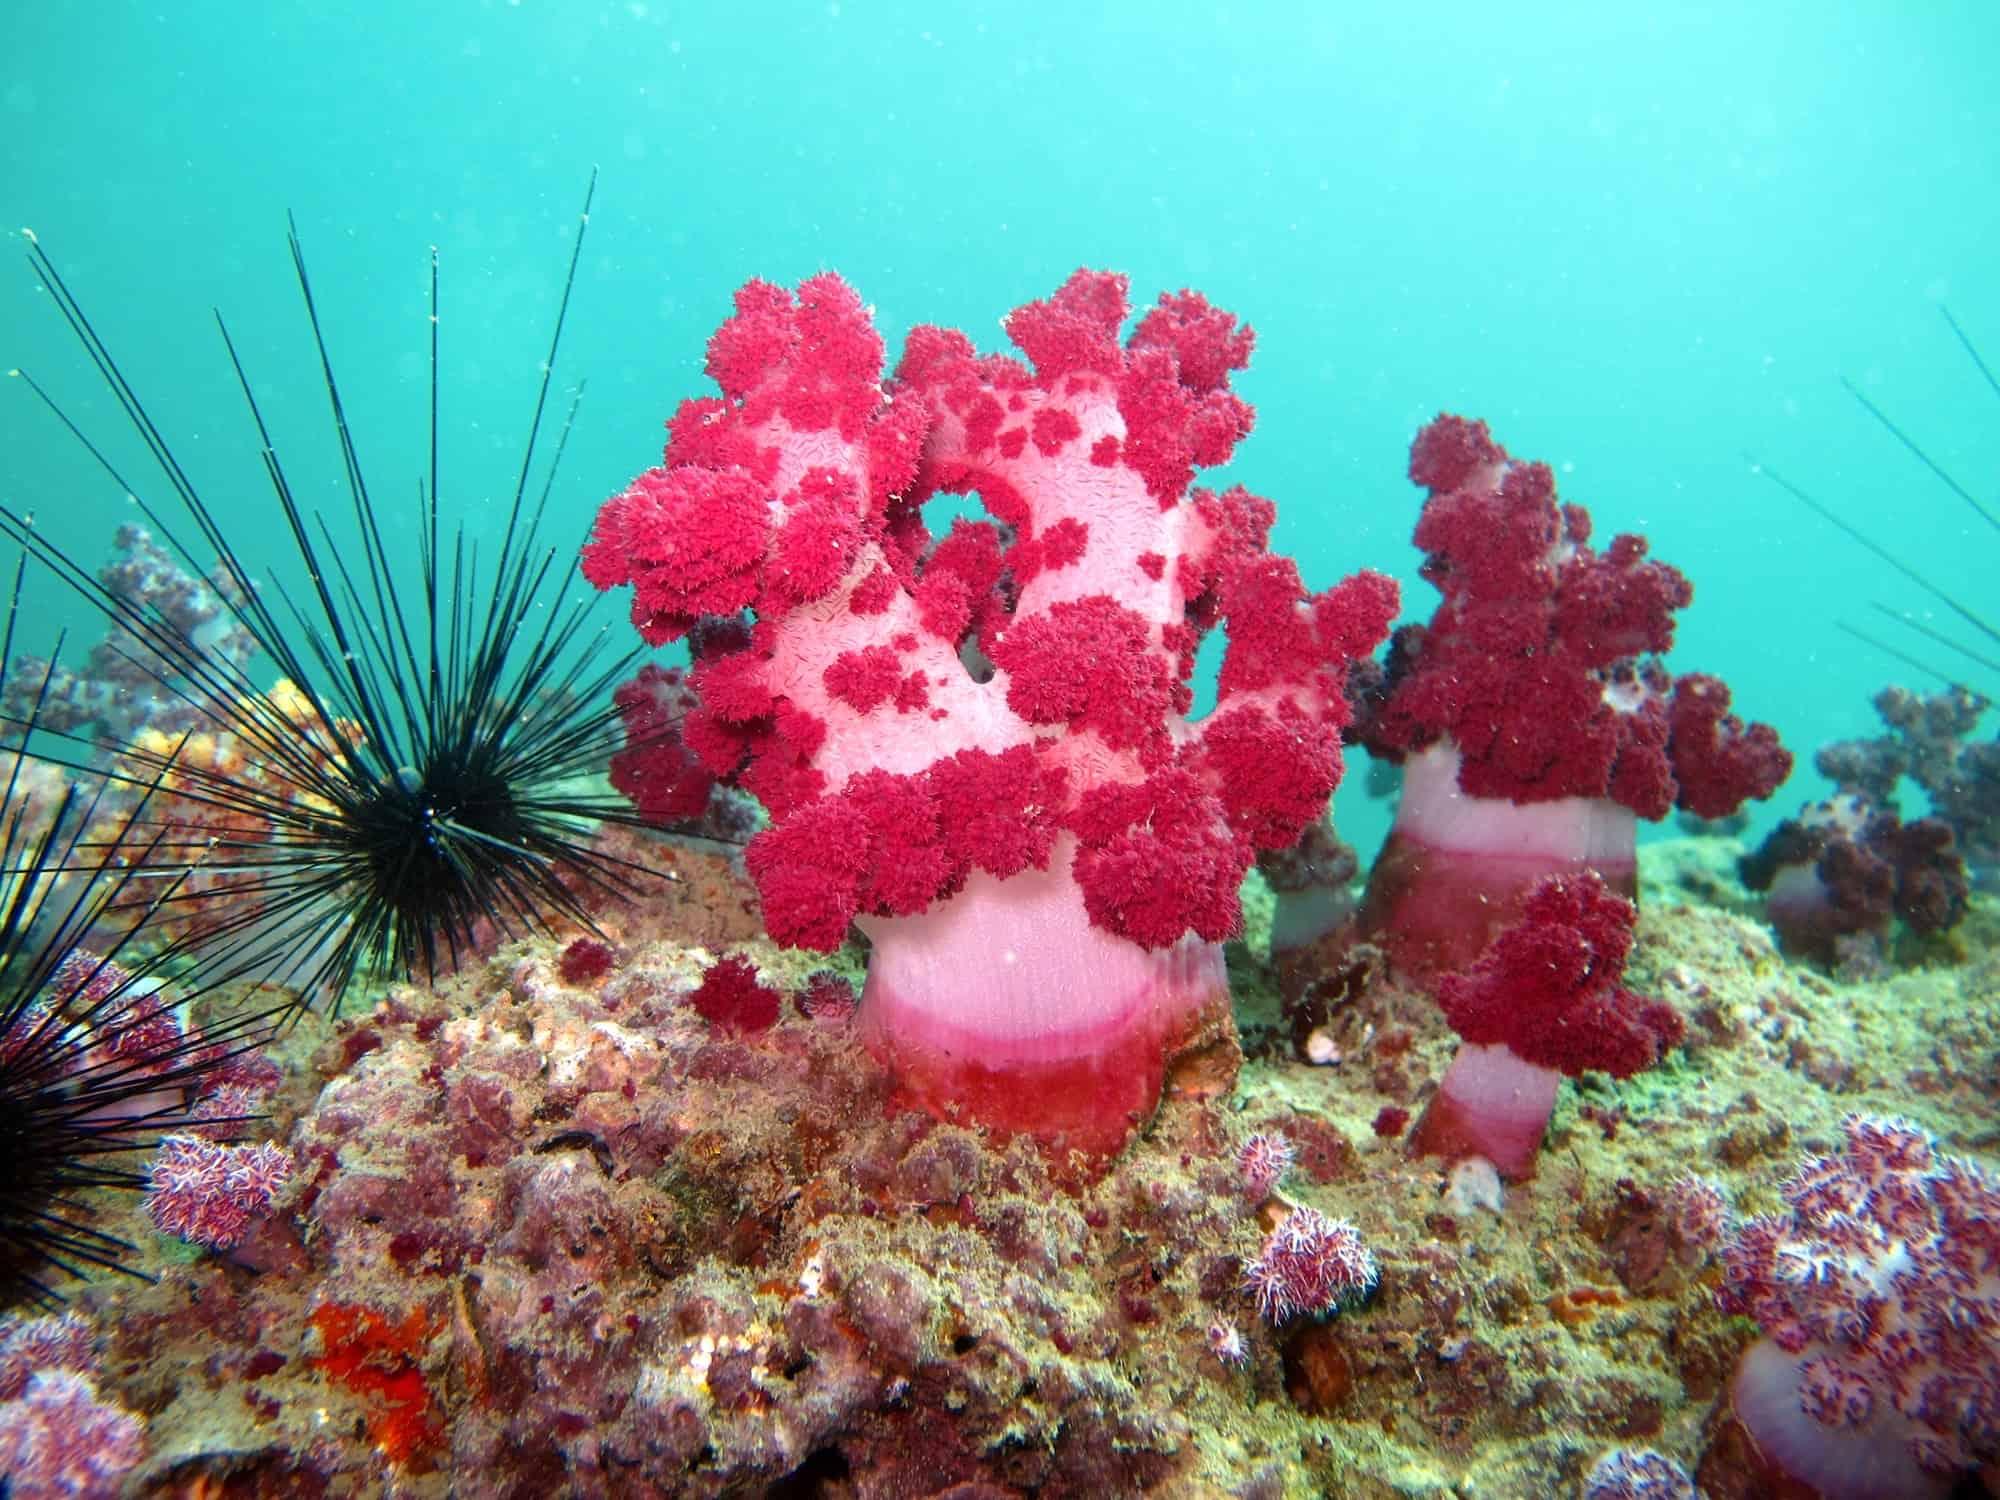 bright pink corals